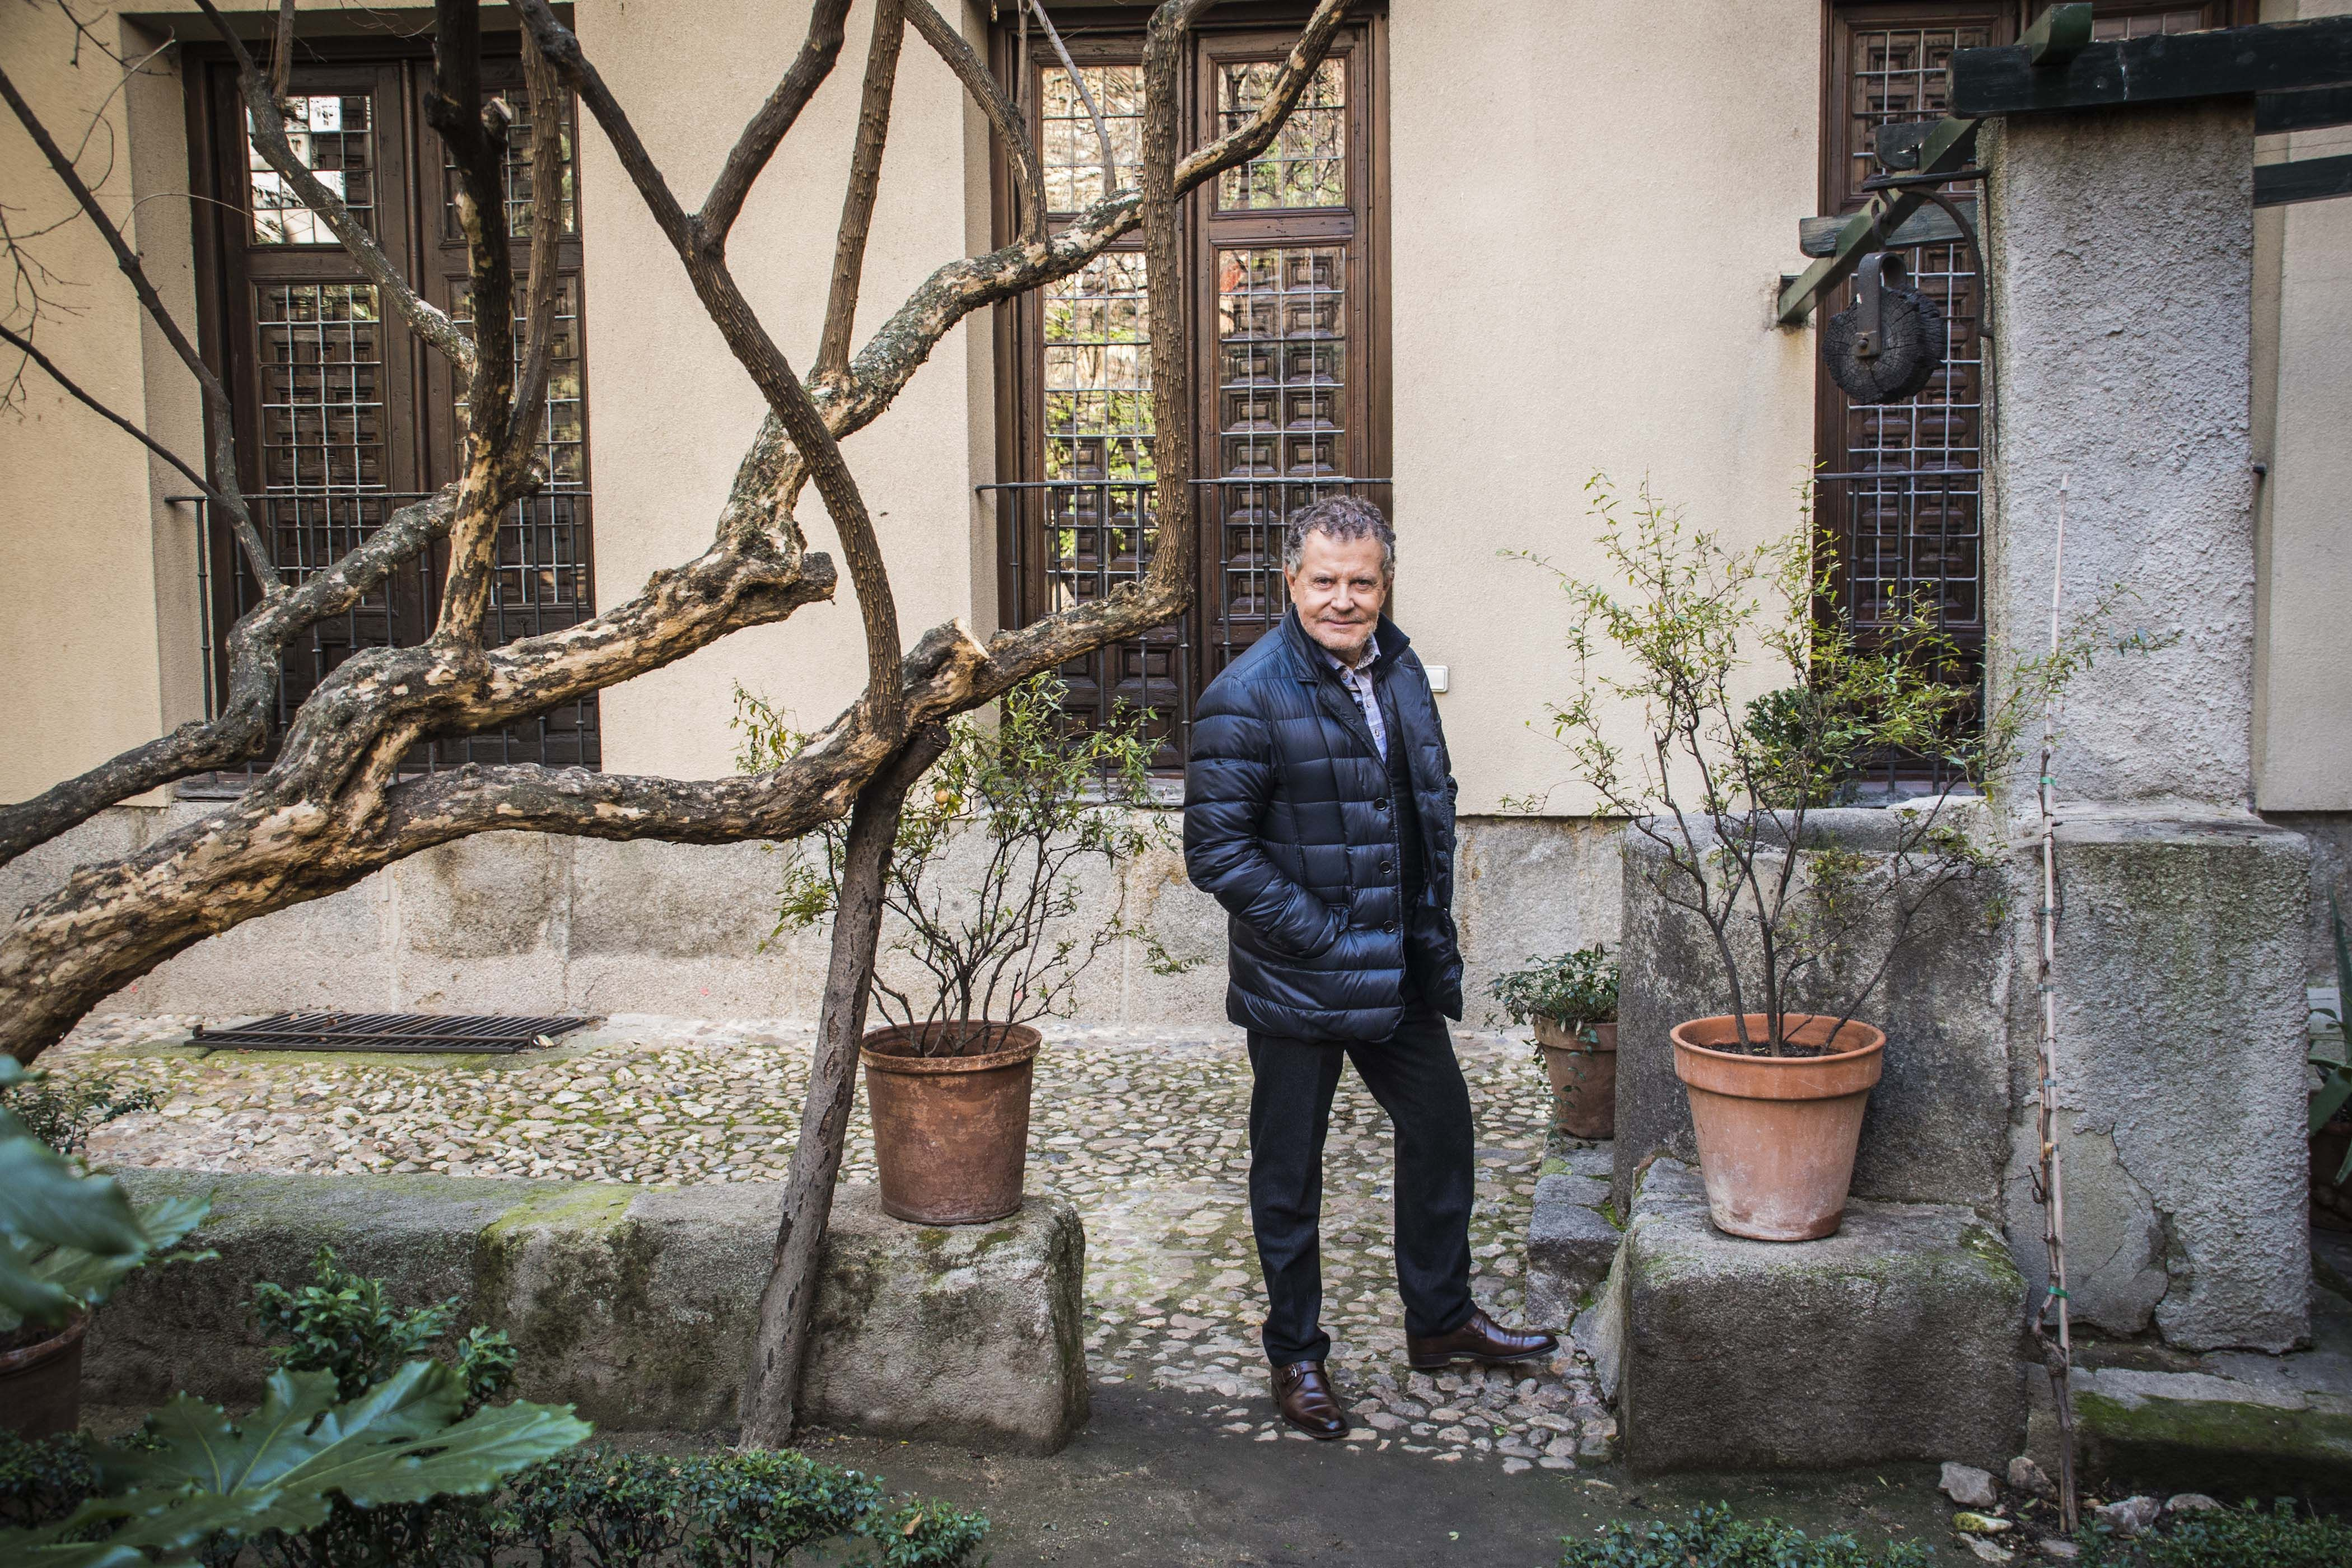 Pascua Ortega posa frente a la fachada de la casa de Lope de Vega, que le encanta. http://decasa.tv/minisites/con-nombre-propio/pascua-ortega